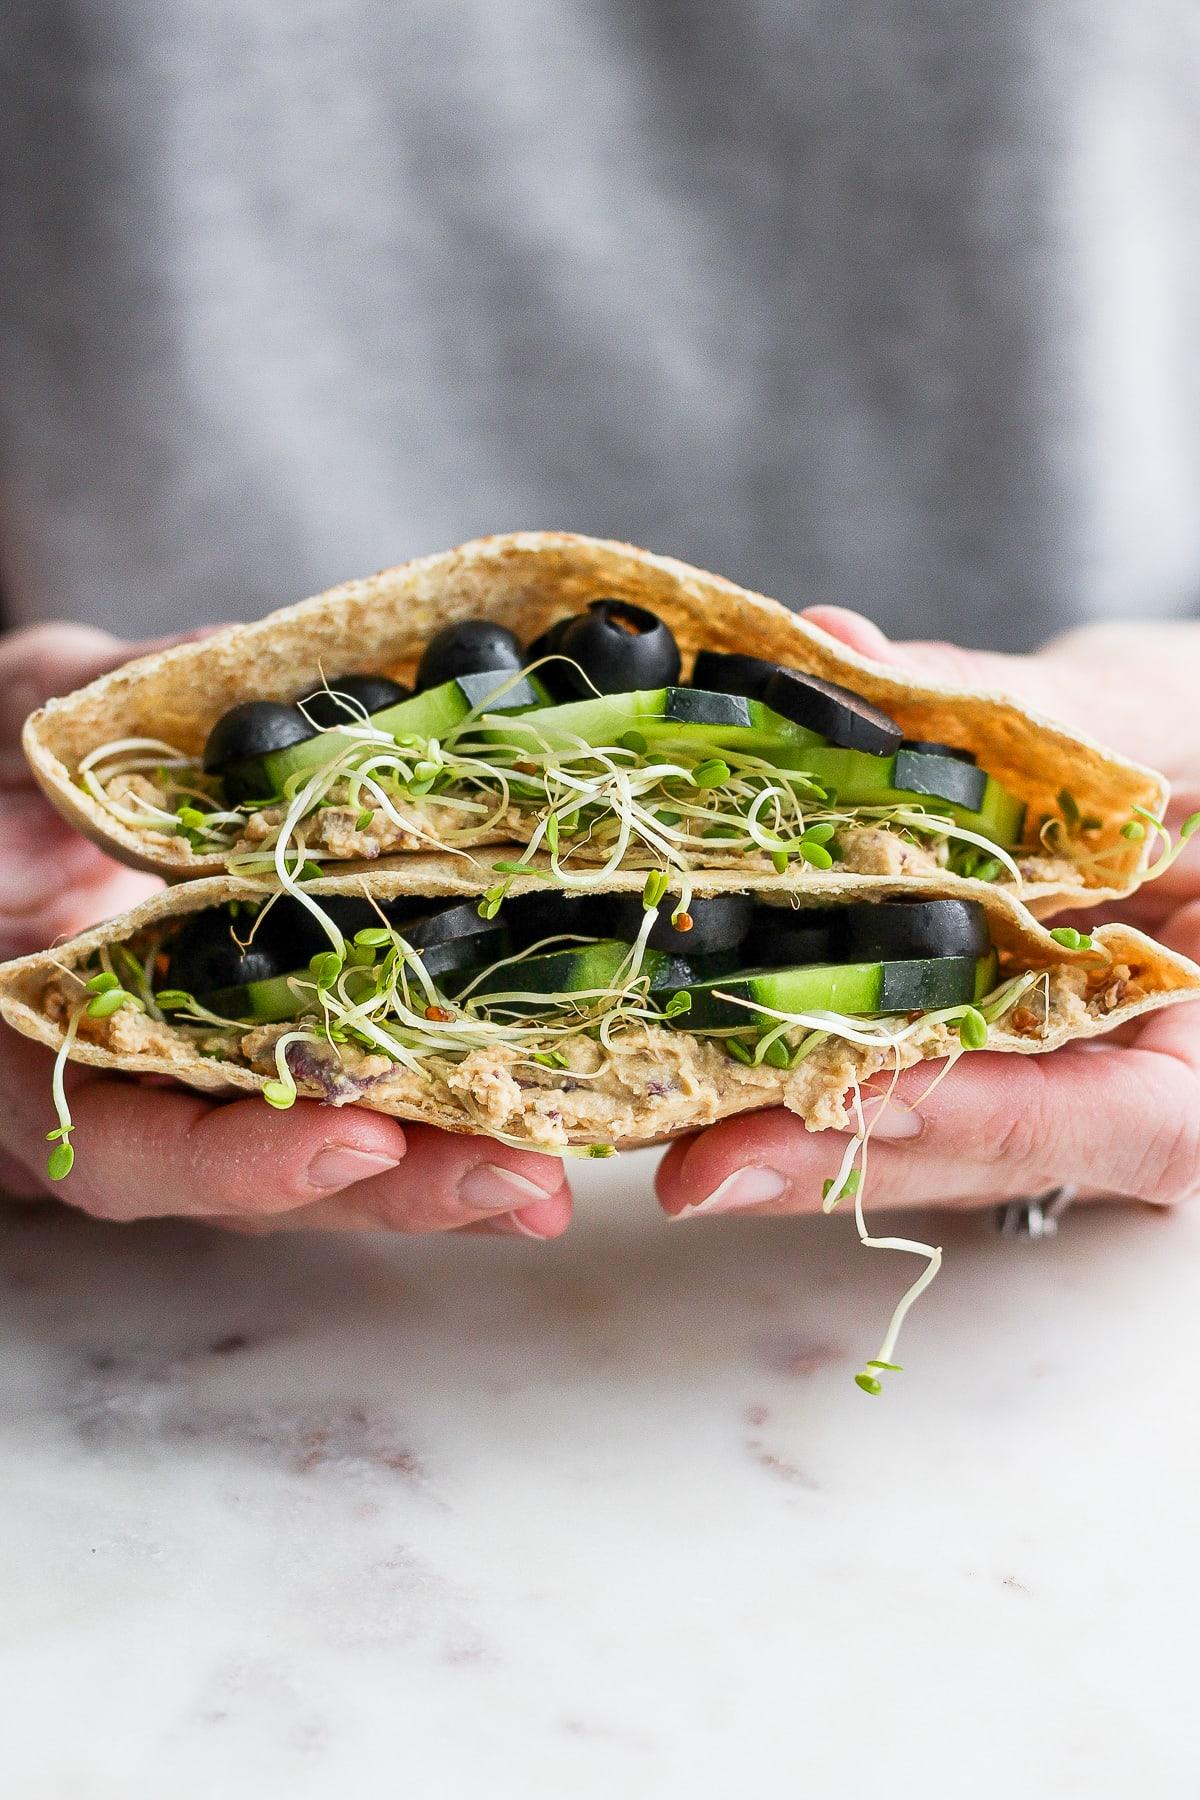 Someone holding two sides of a vegan pita sandwich.